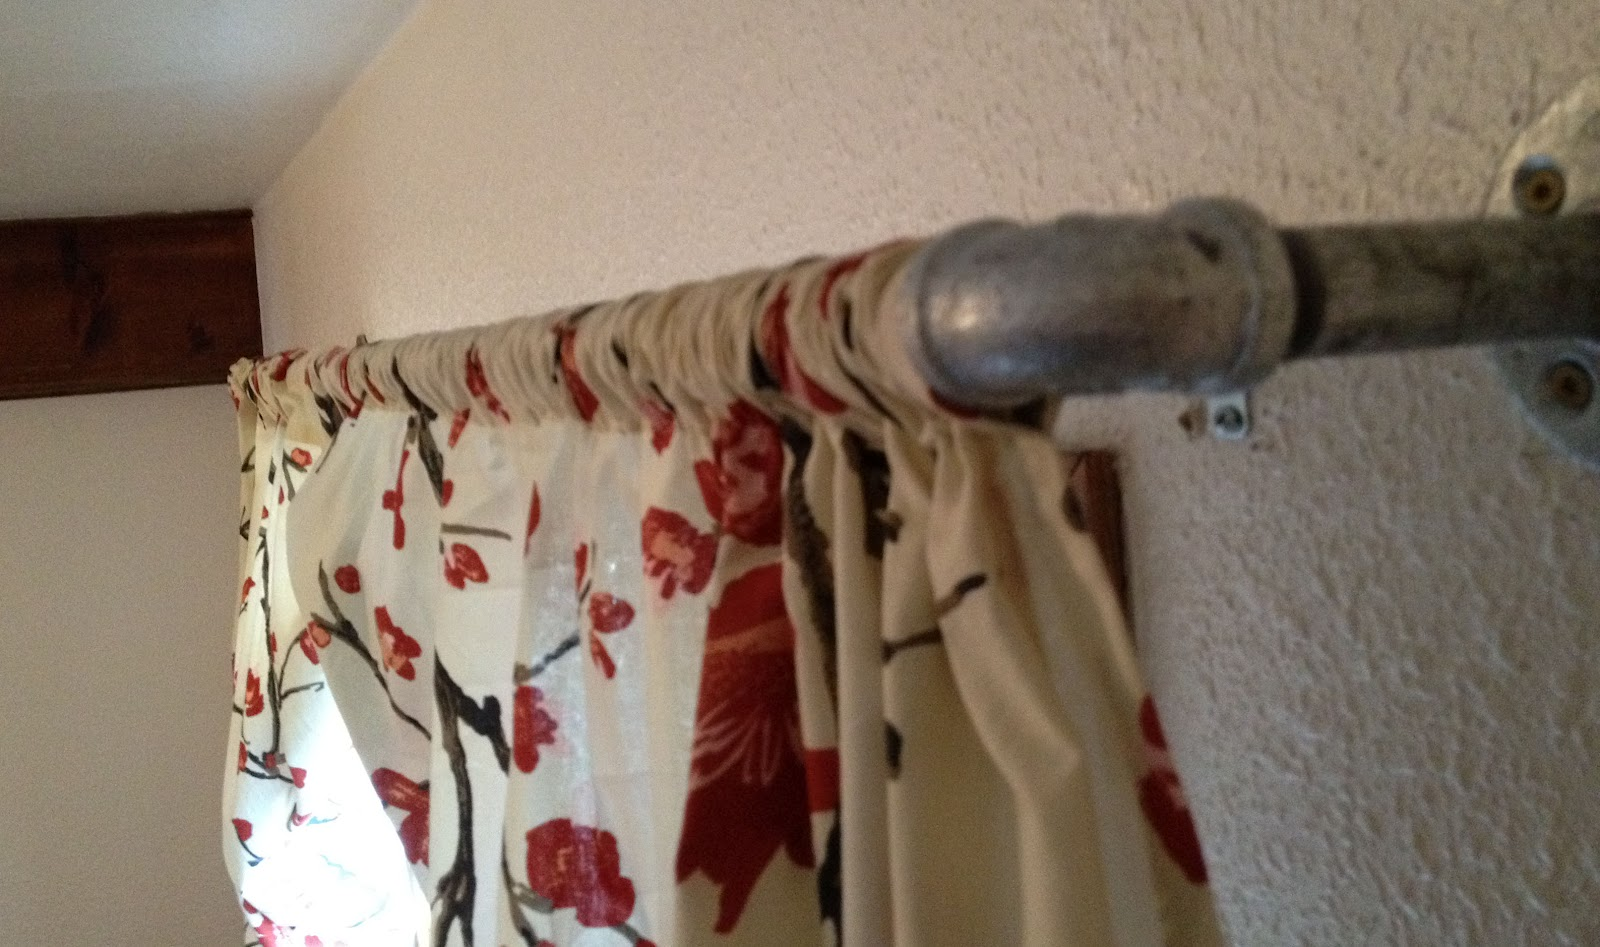 8. SIMPHOME.COM An Industrial Pipe Curtain Rod